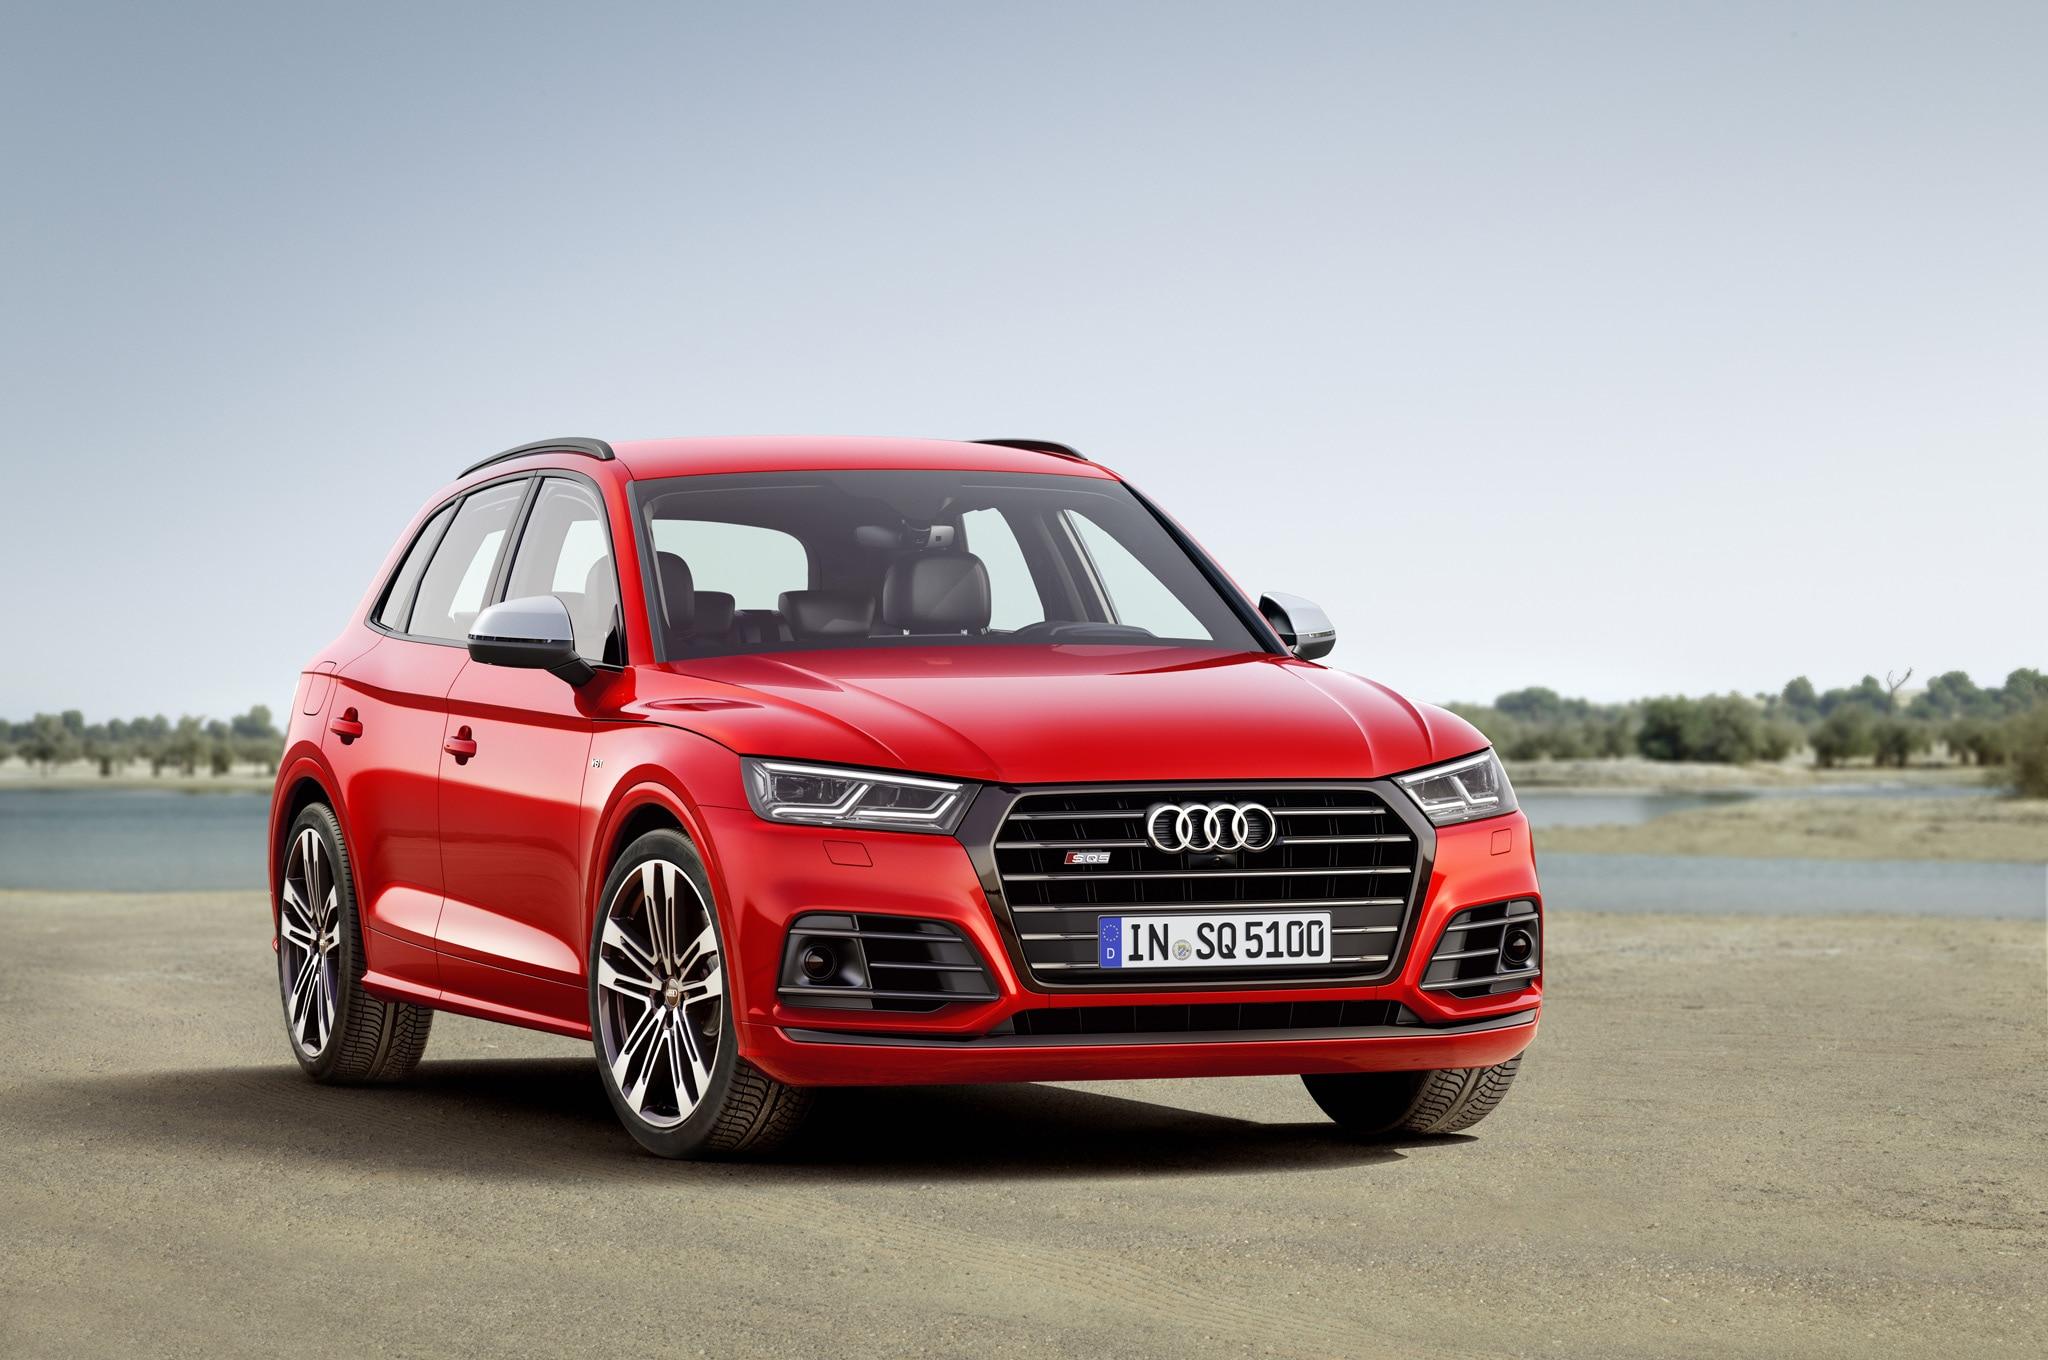 First Look: 2018 Audi SQ5 | Automobile Magazine